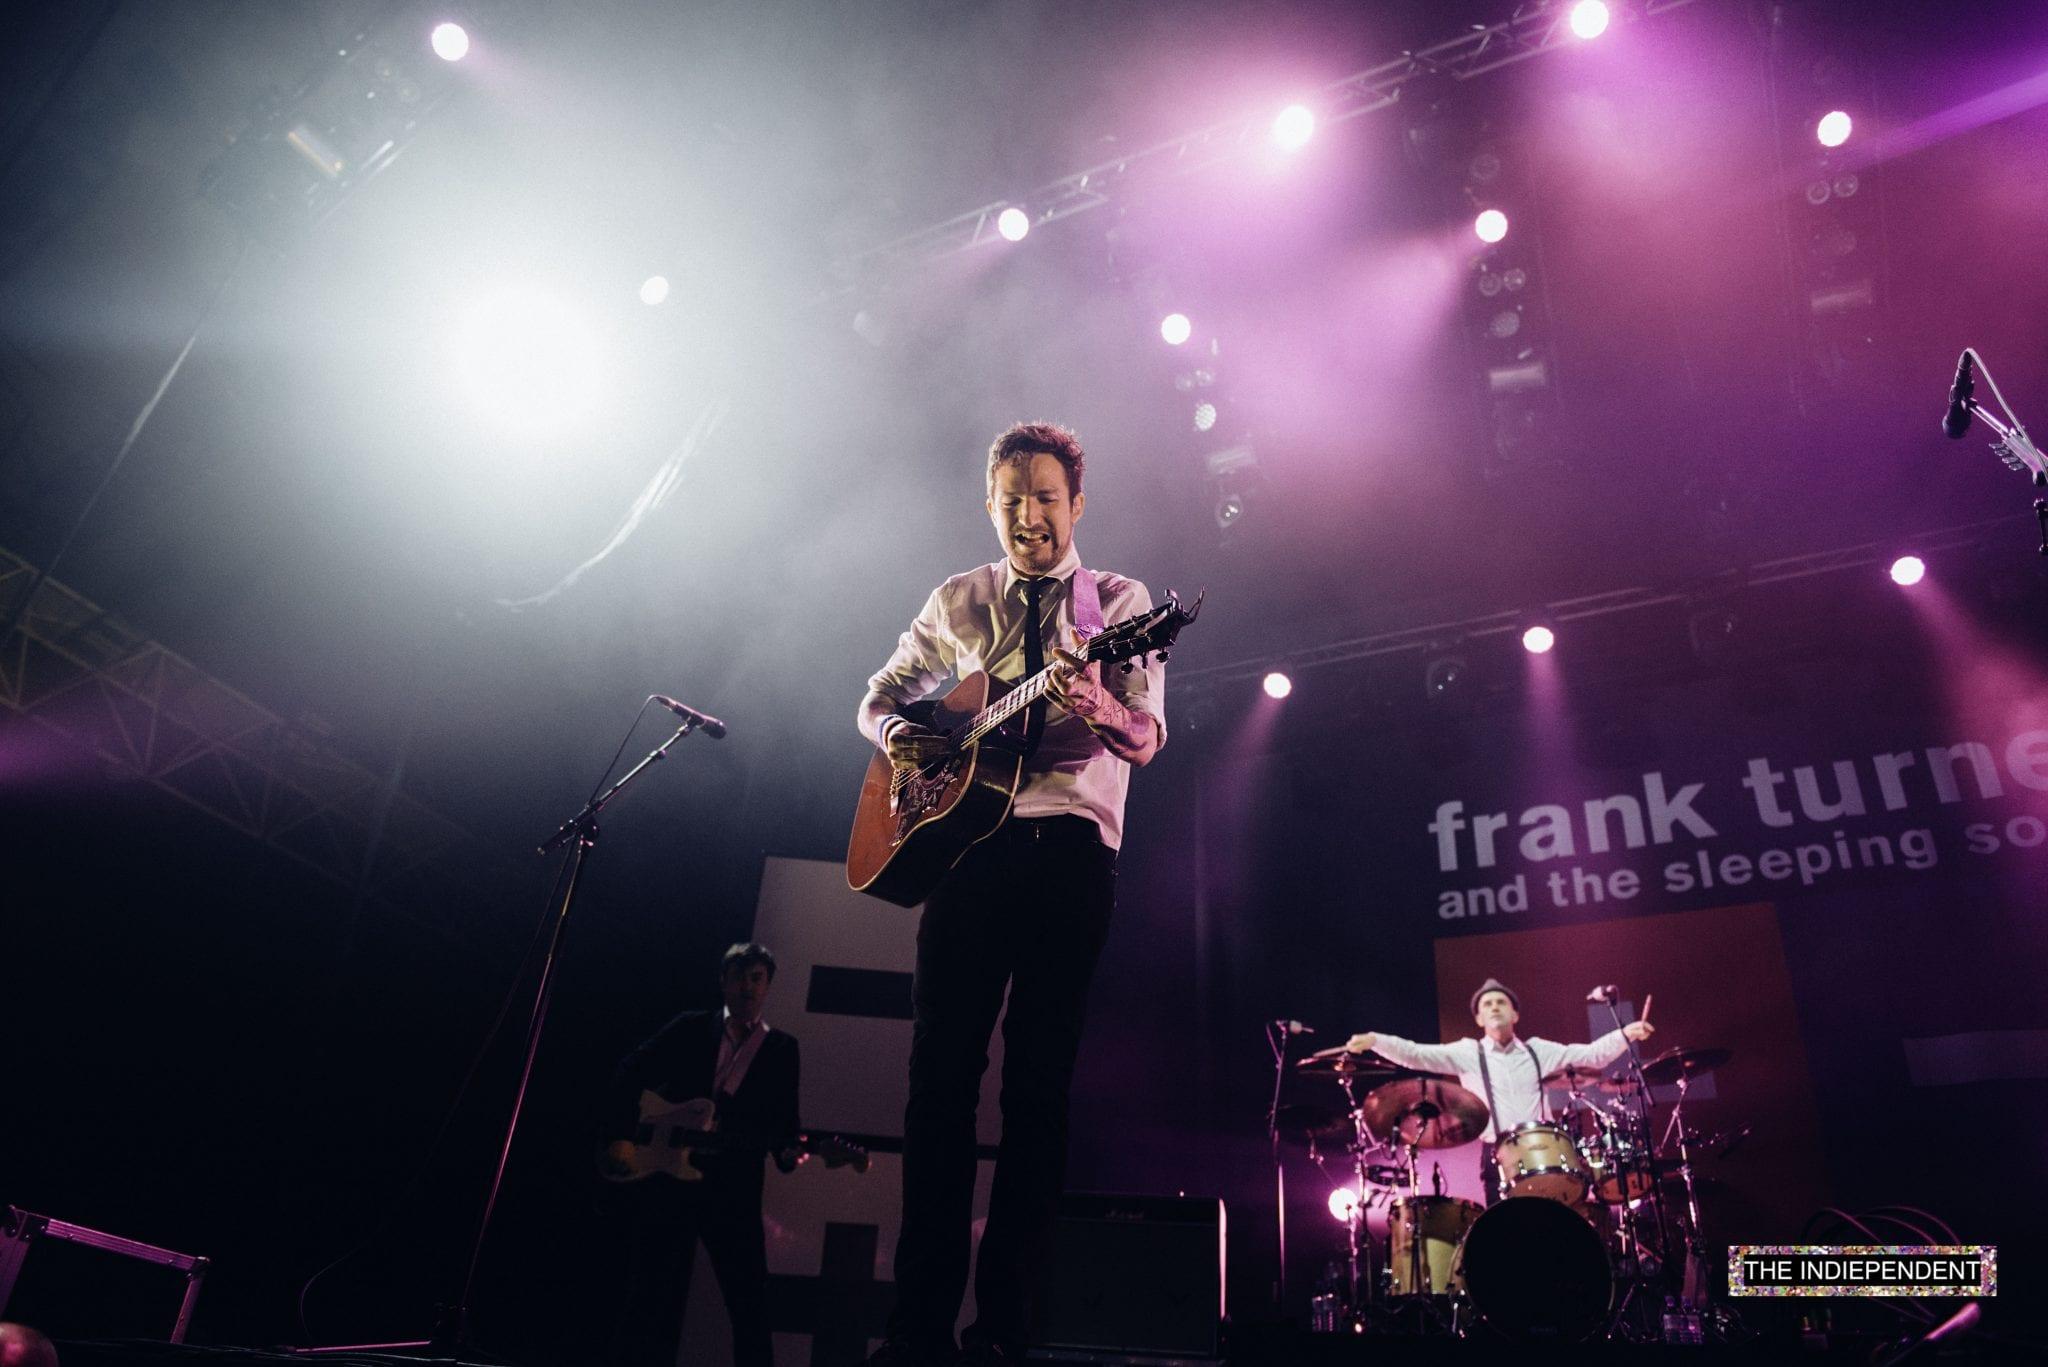 Gallery: Frank Turner // Alexandra Palace 26.11.15